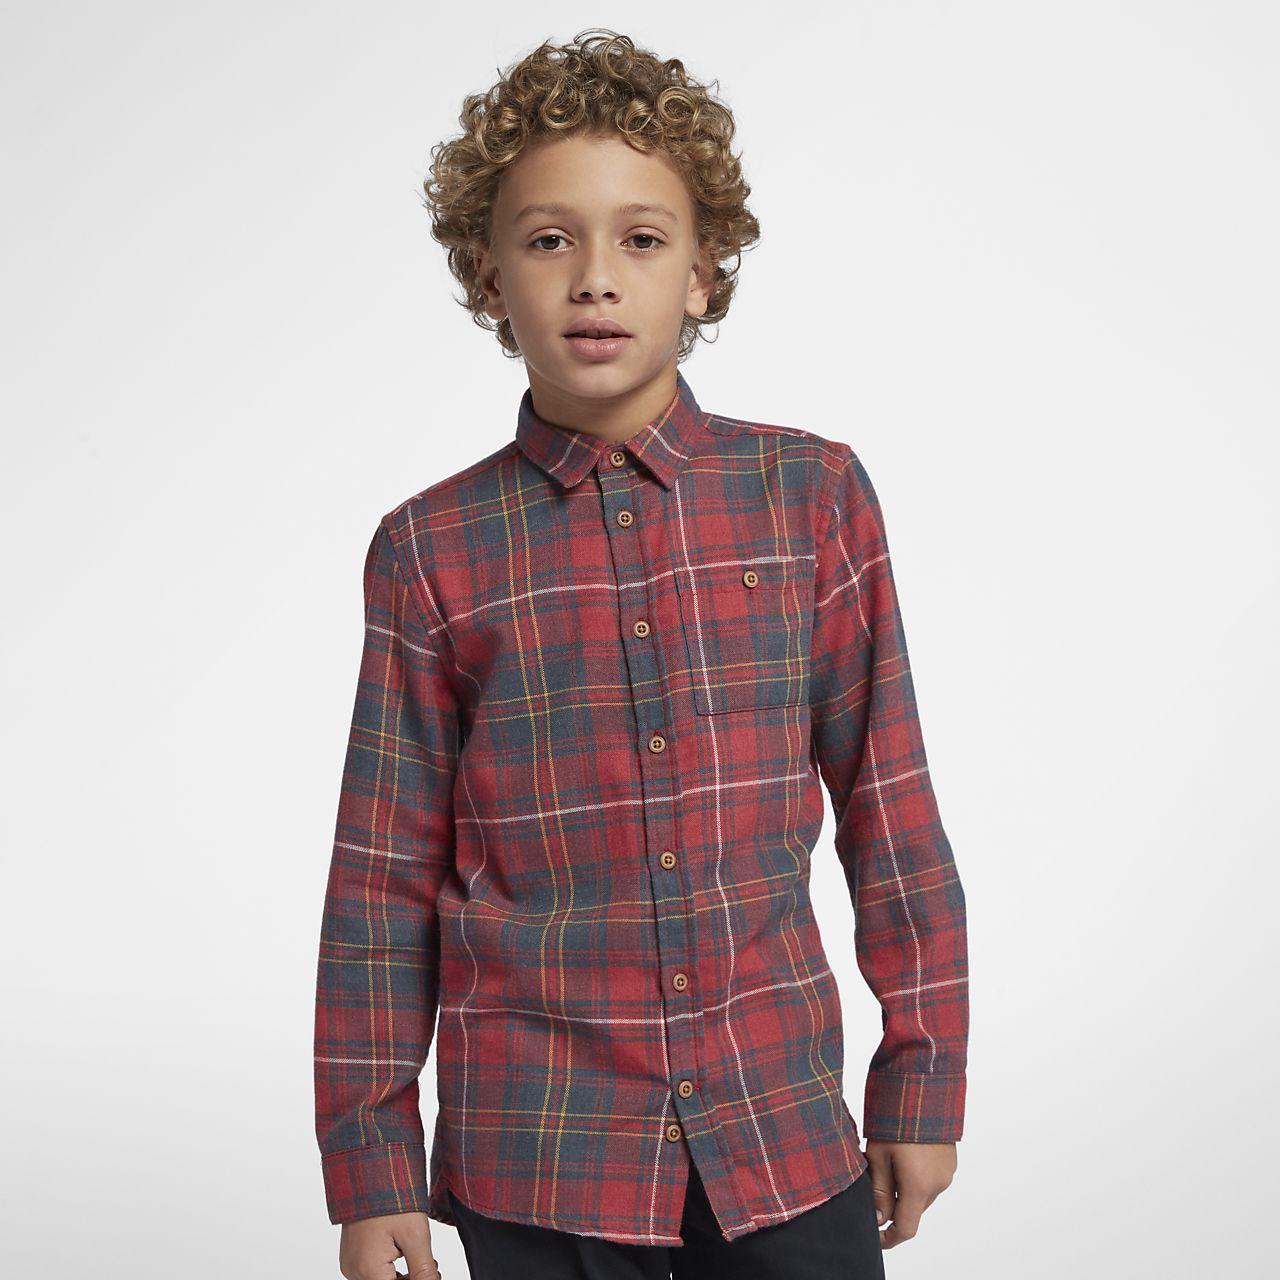 Hurley Kurt Boys' Long-Sleeve Shirt